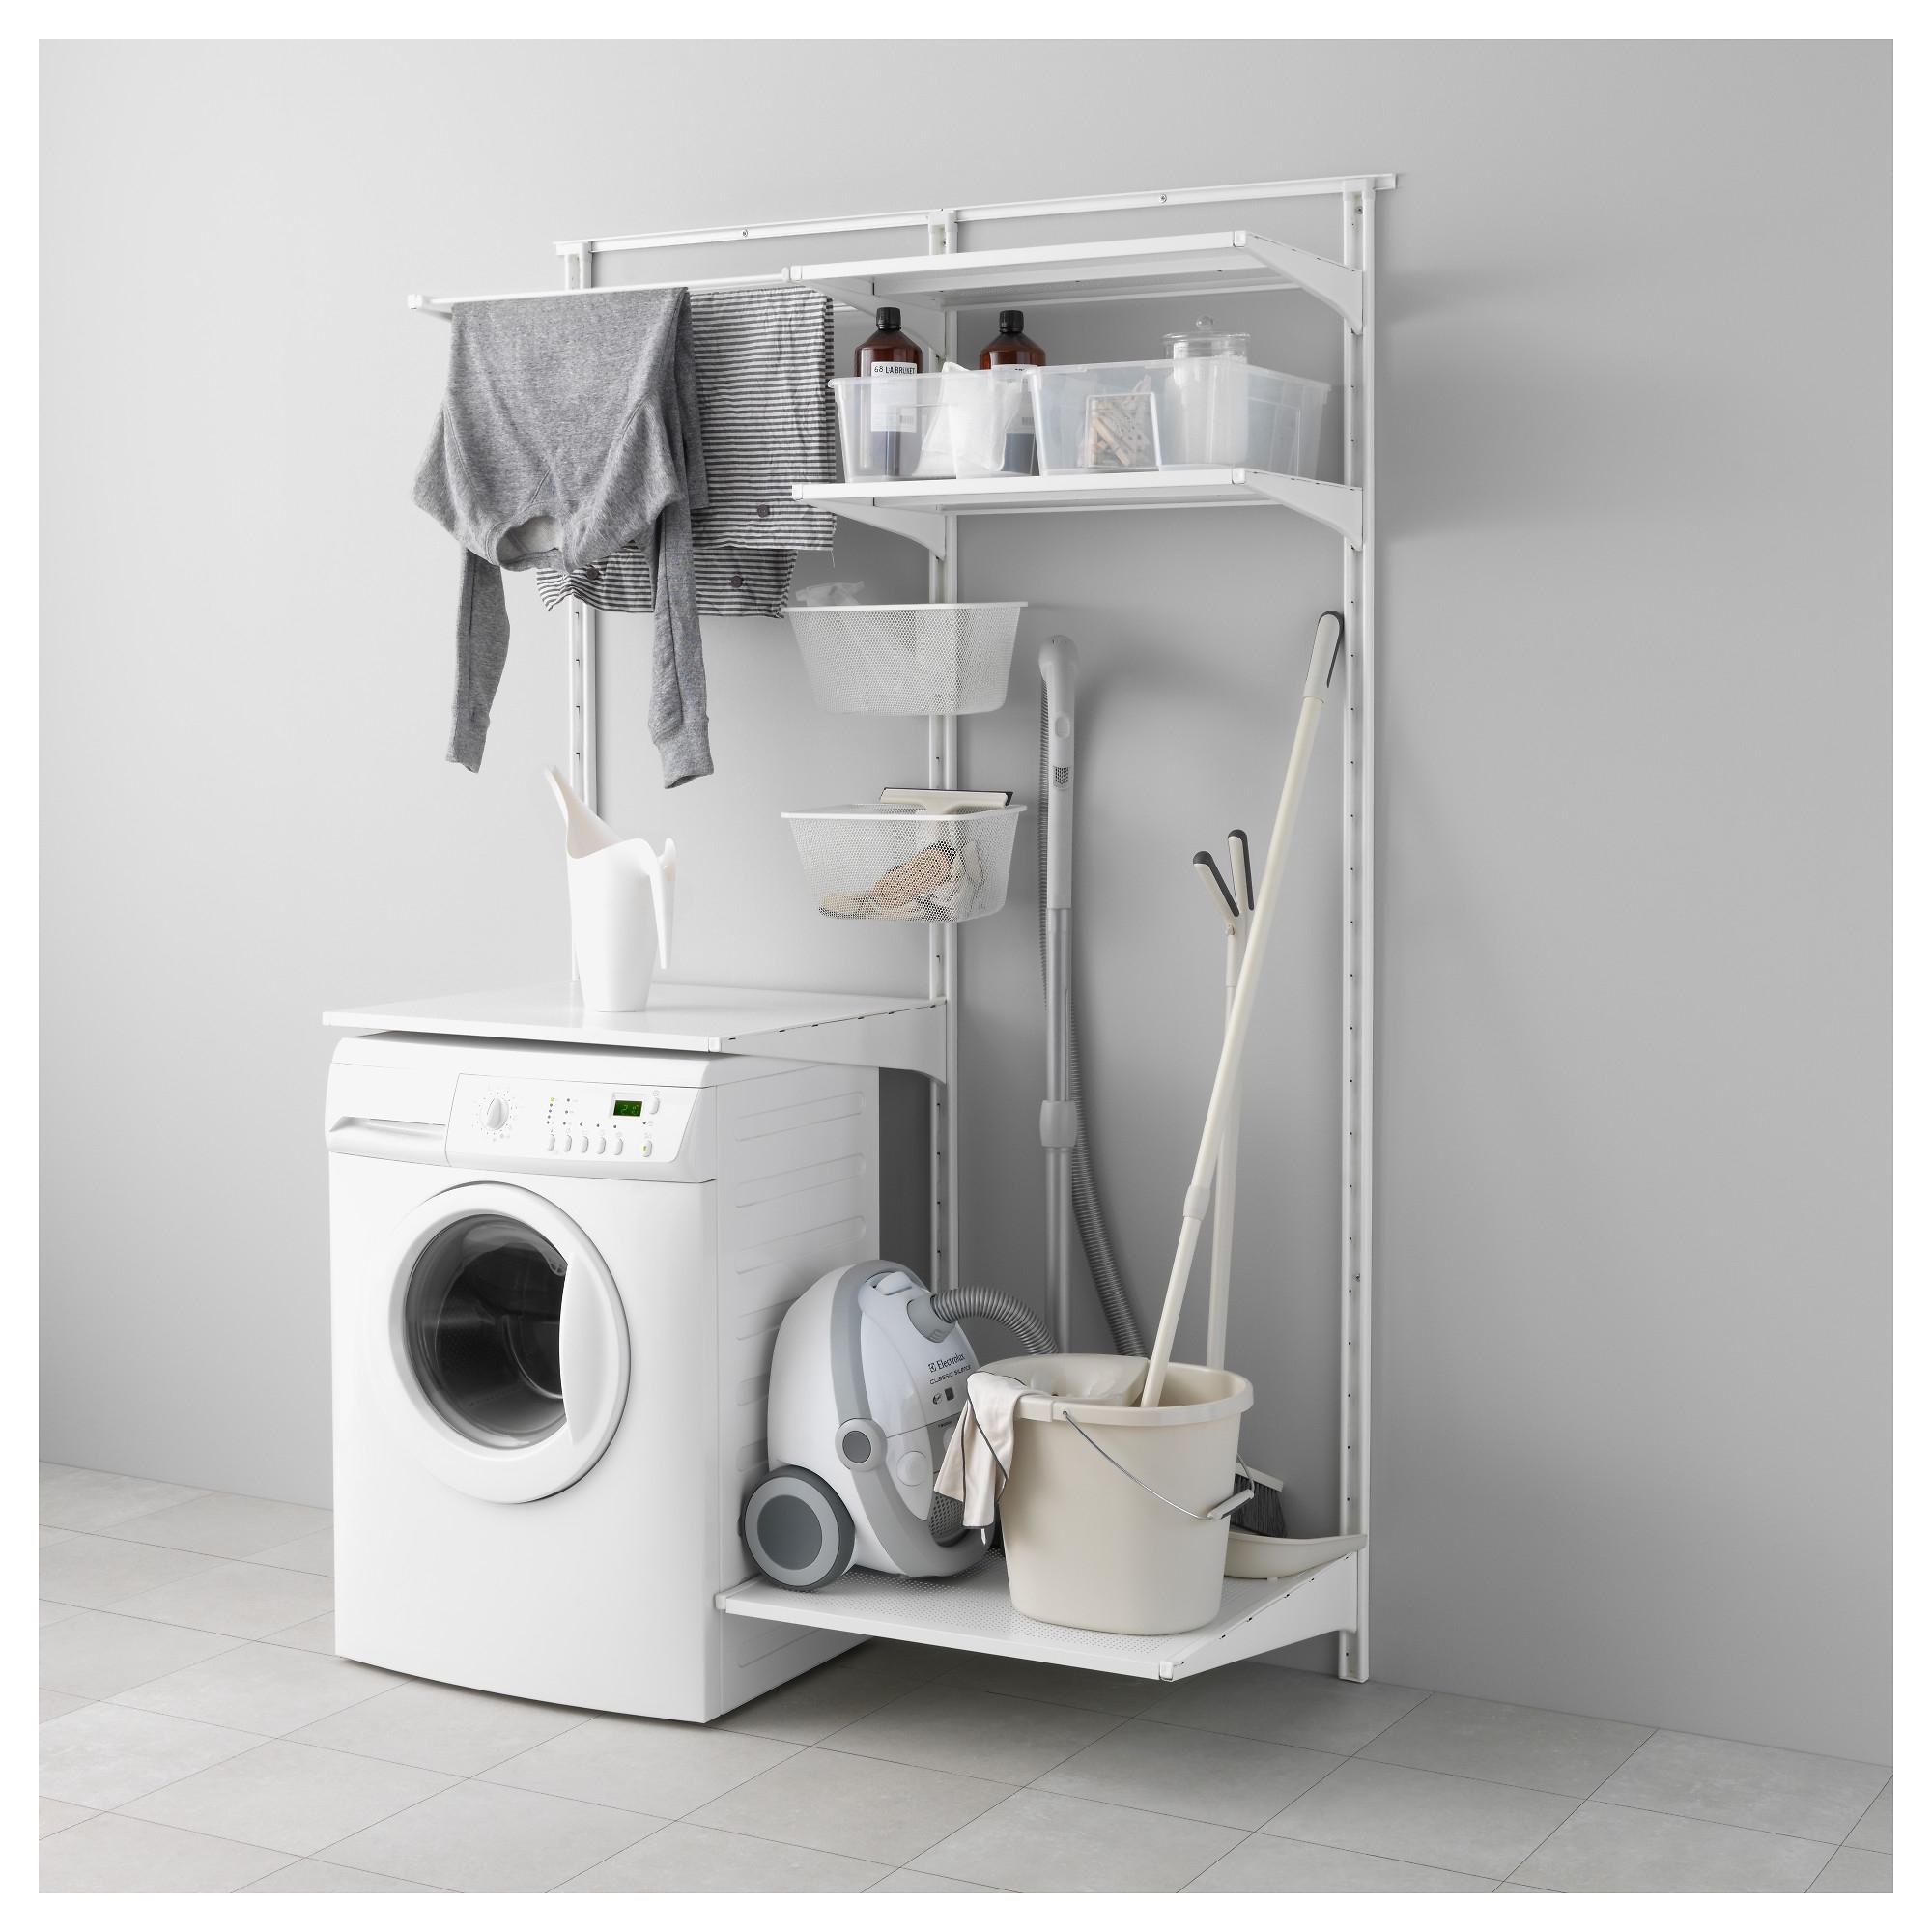 Algot muebles modulares - Ikea muebles modulares ...